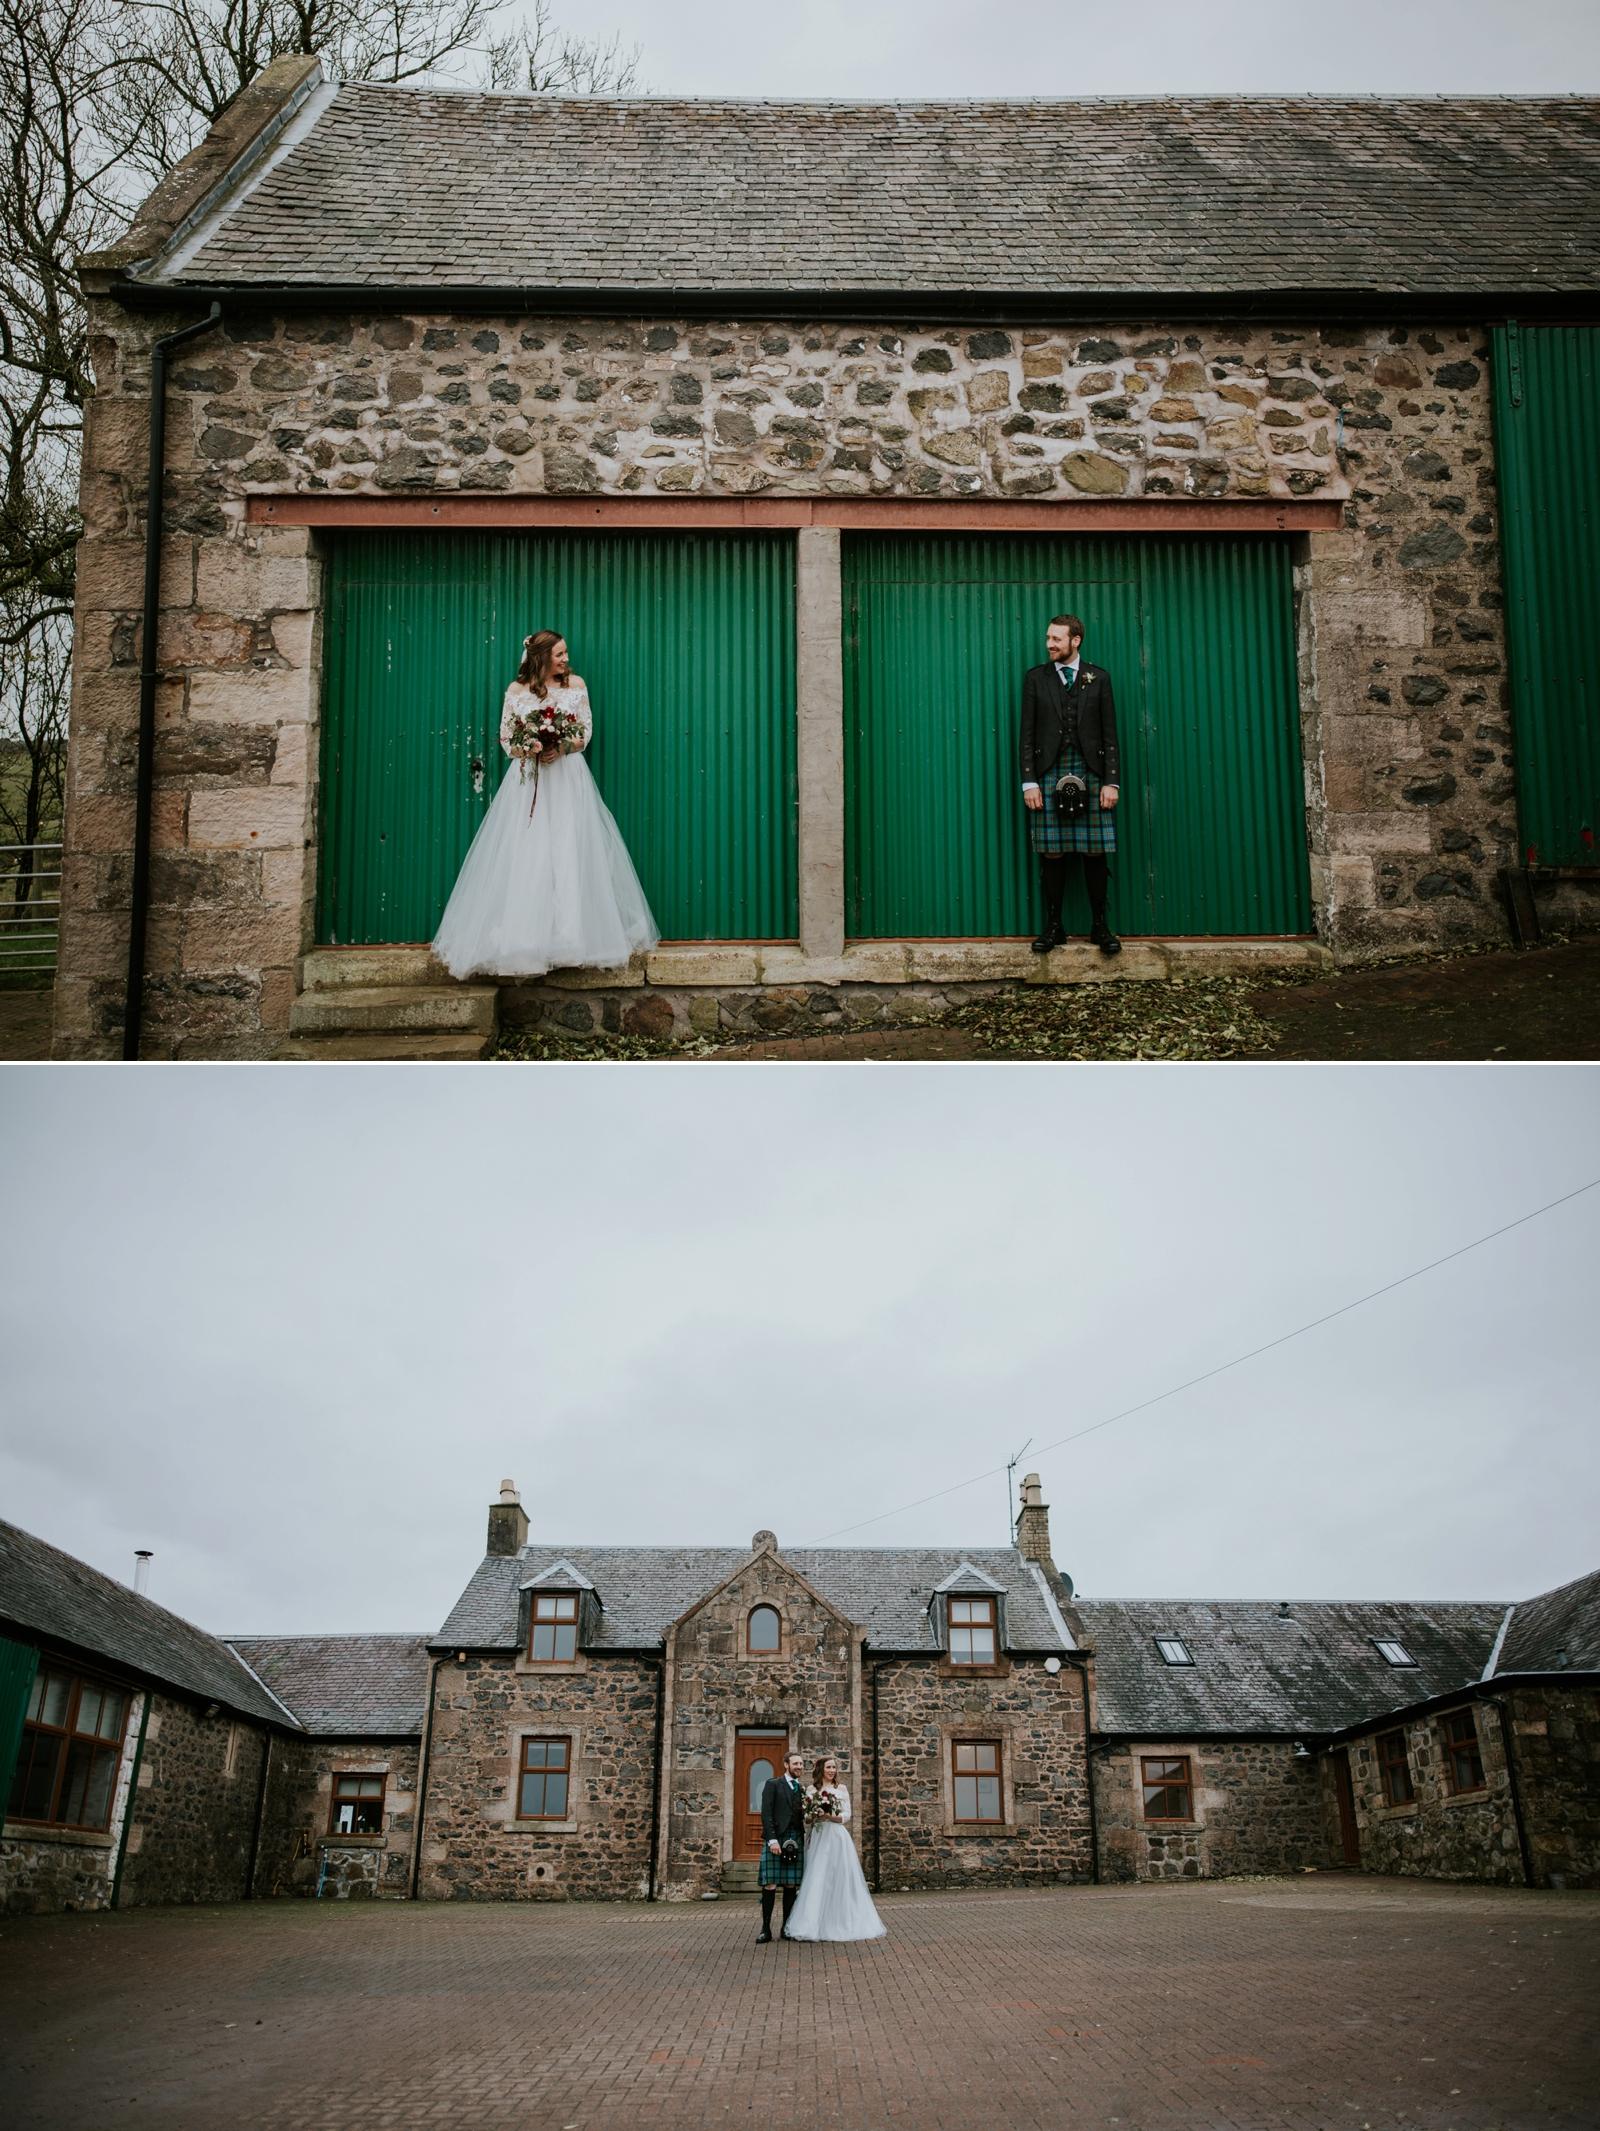 HarelawFarm_Ayrshire_Nuala&Colin_IntheNameofLovePhotography_0113.jpg